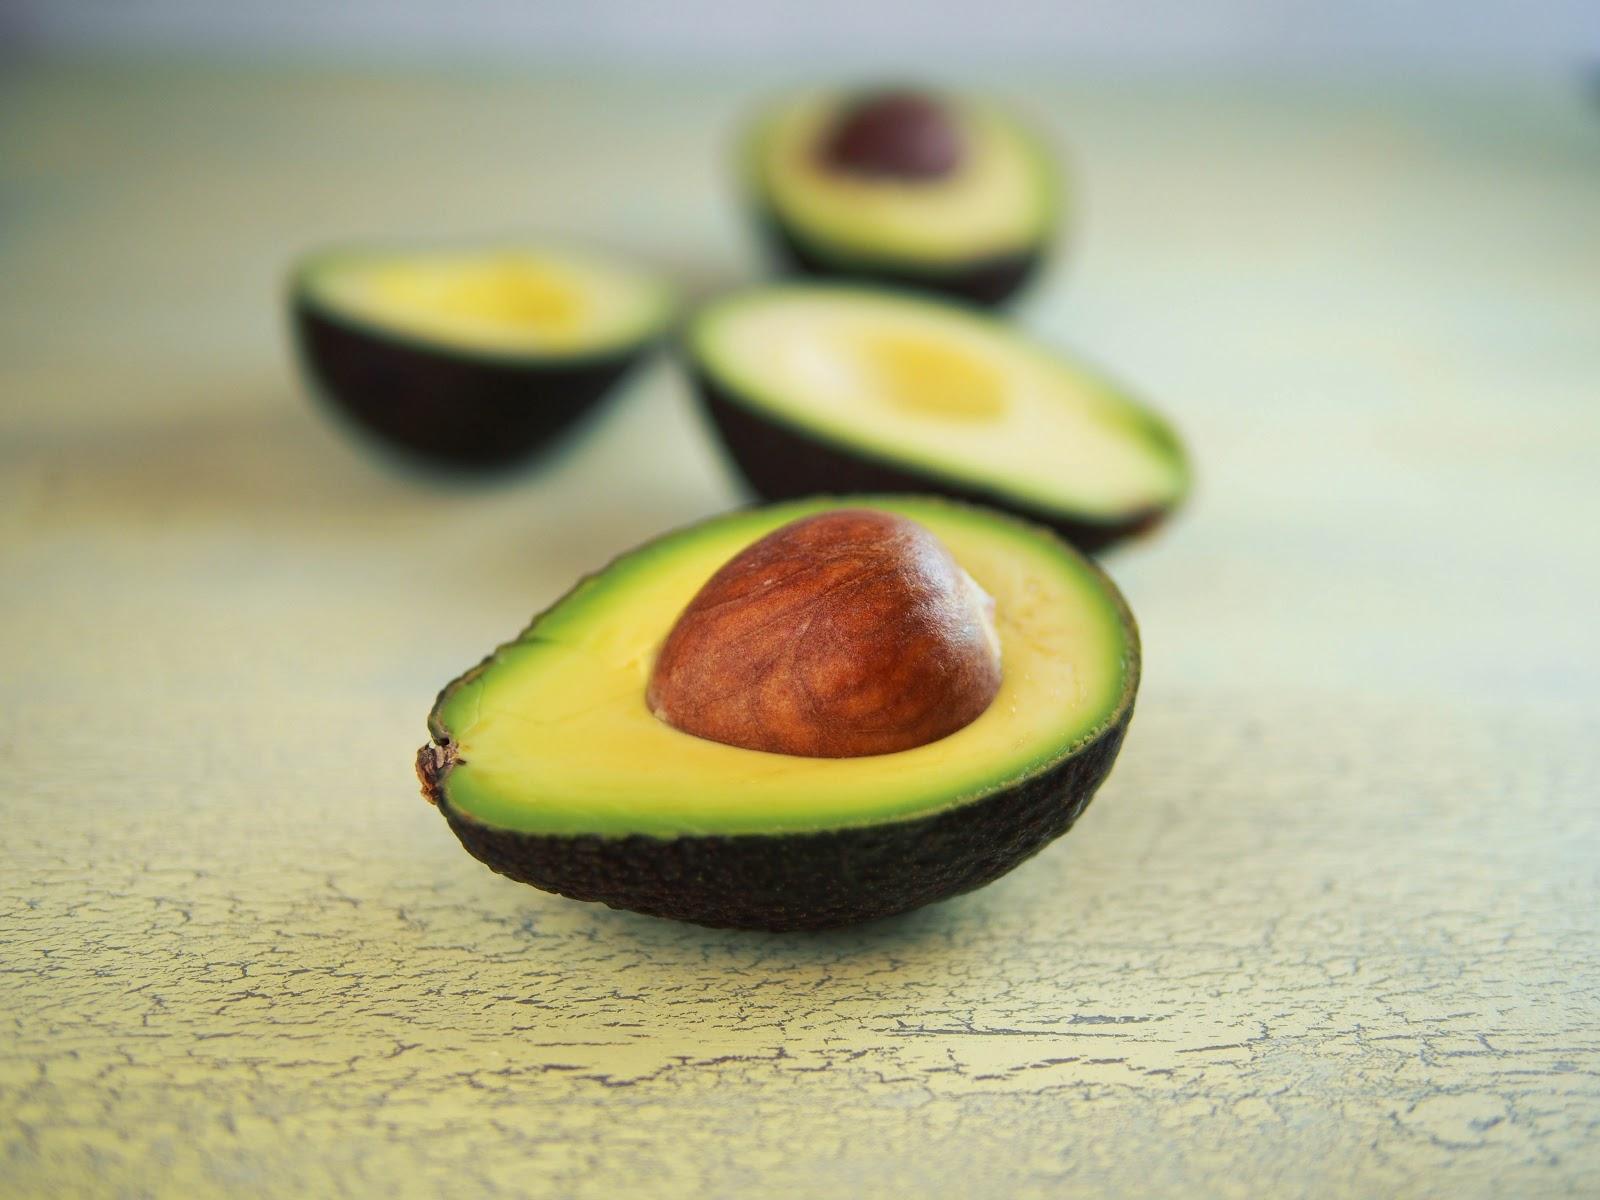 ... avocado coconut ice cream with gula malaka (Palm sugar) sound just